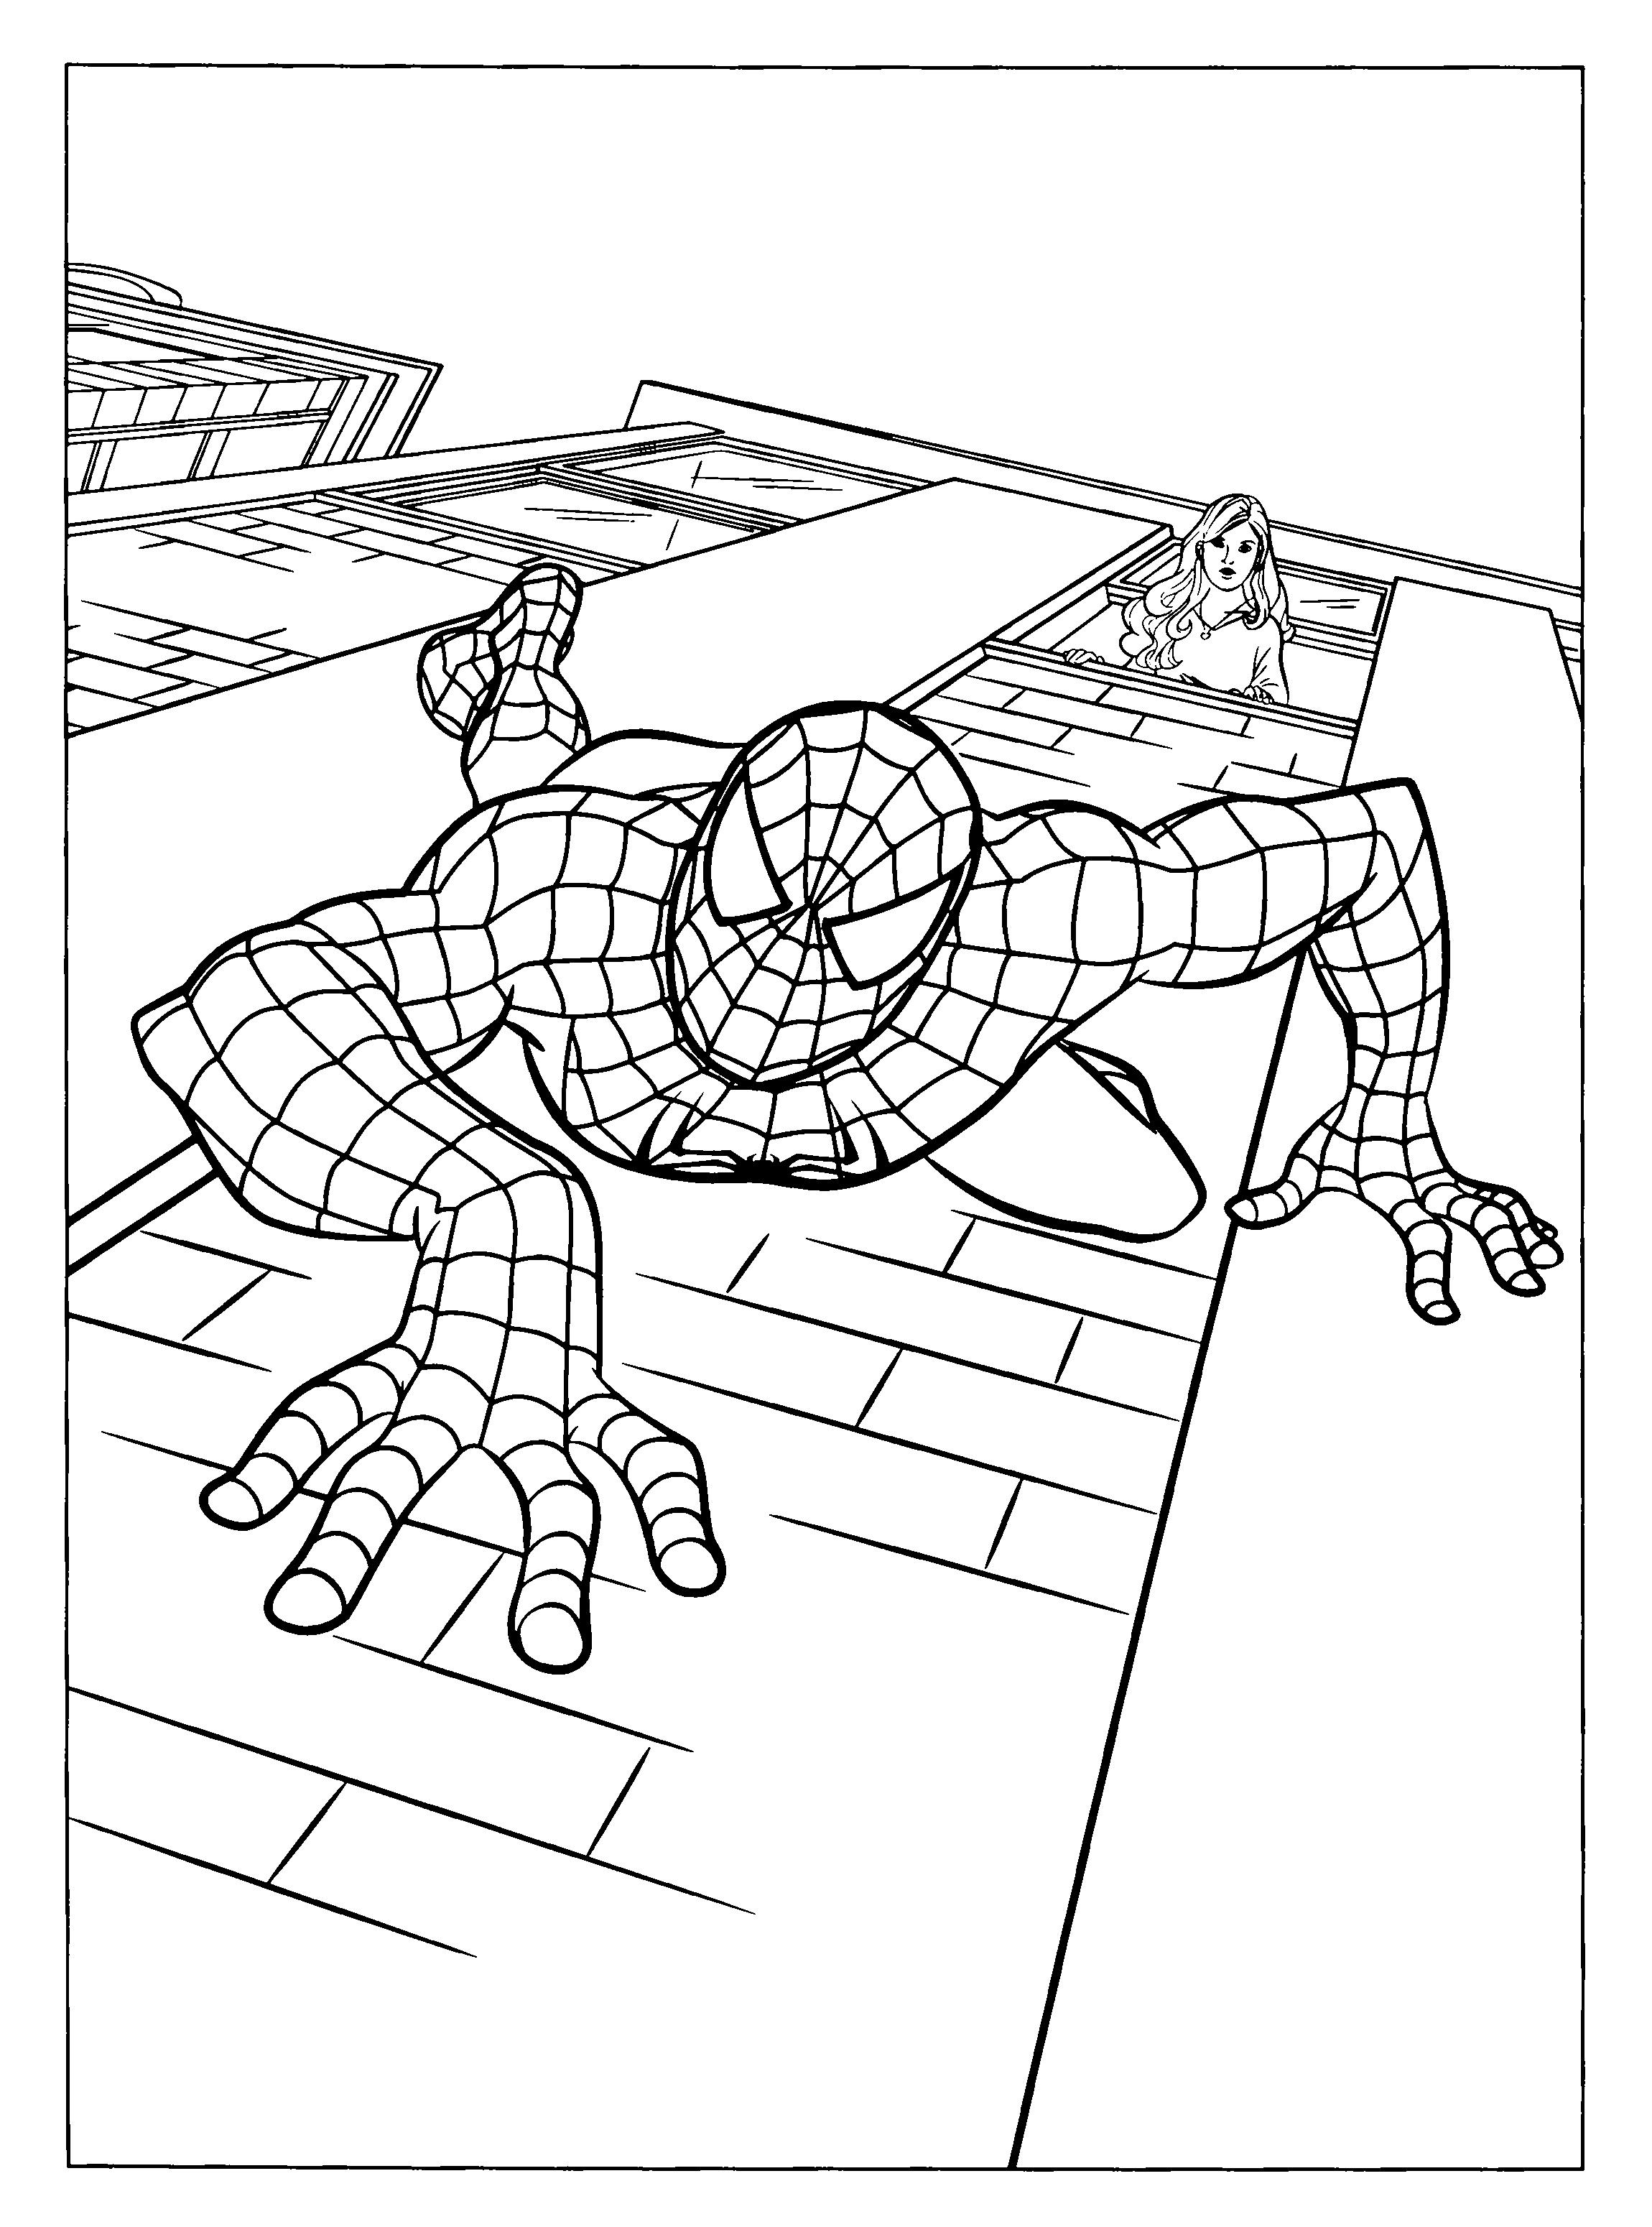 2300x3100 Spiderman Coloring Page Elegant Printable Spiderman Coloring Page